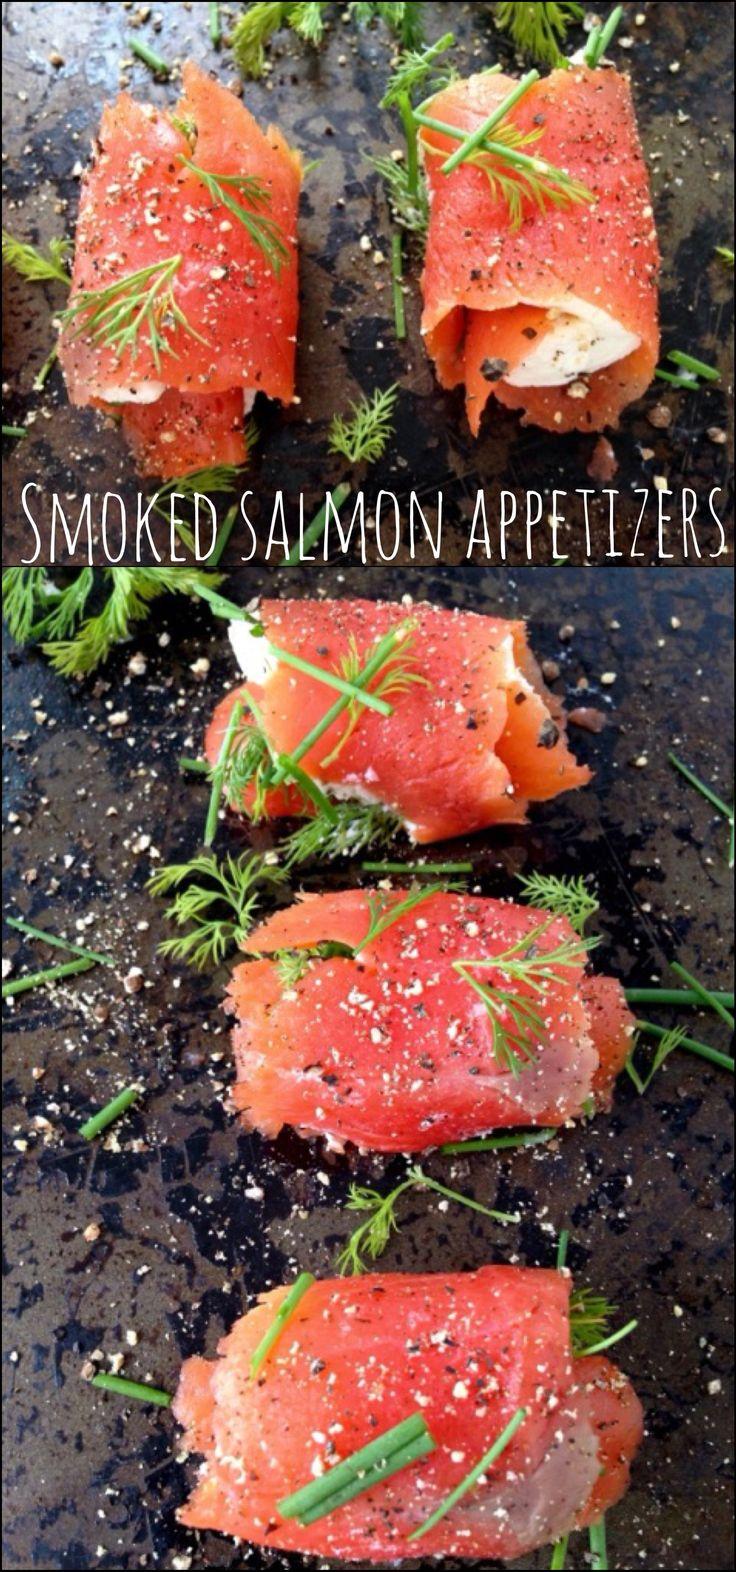 Smoked Salmon Appetizers | www.CiaoFlorentina.com